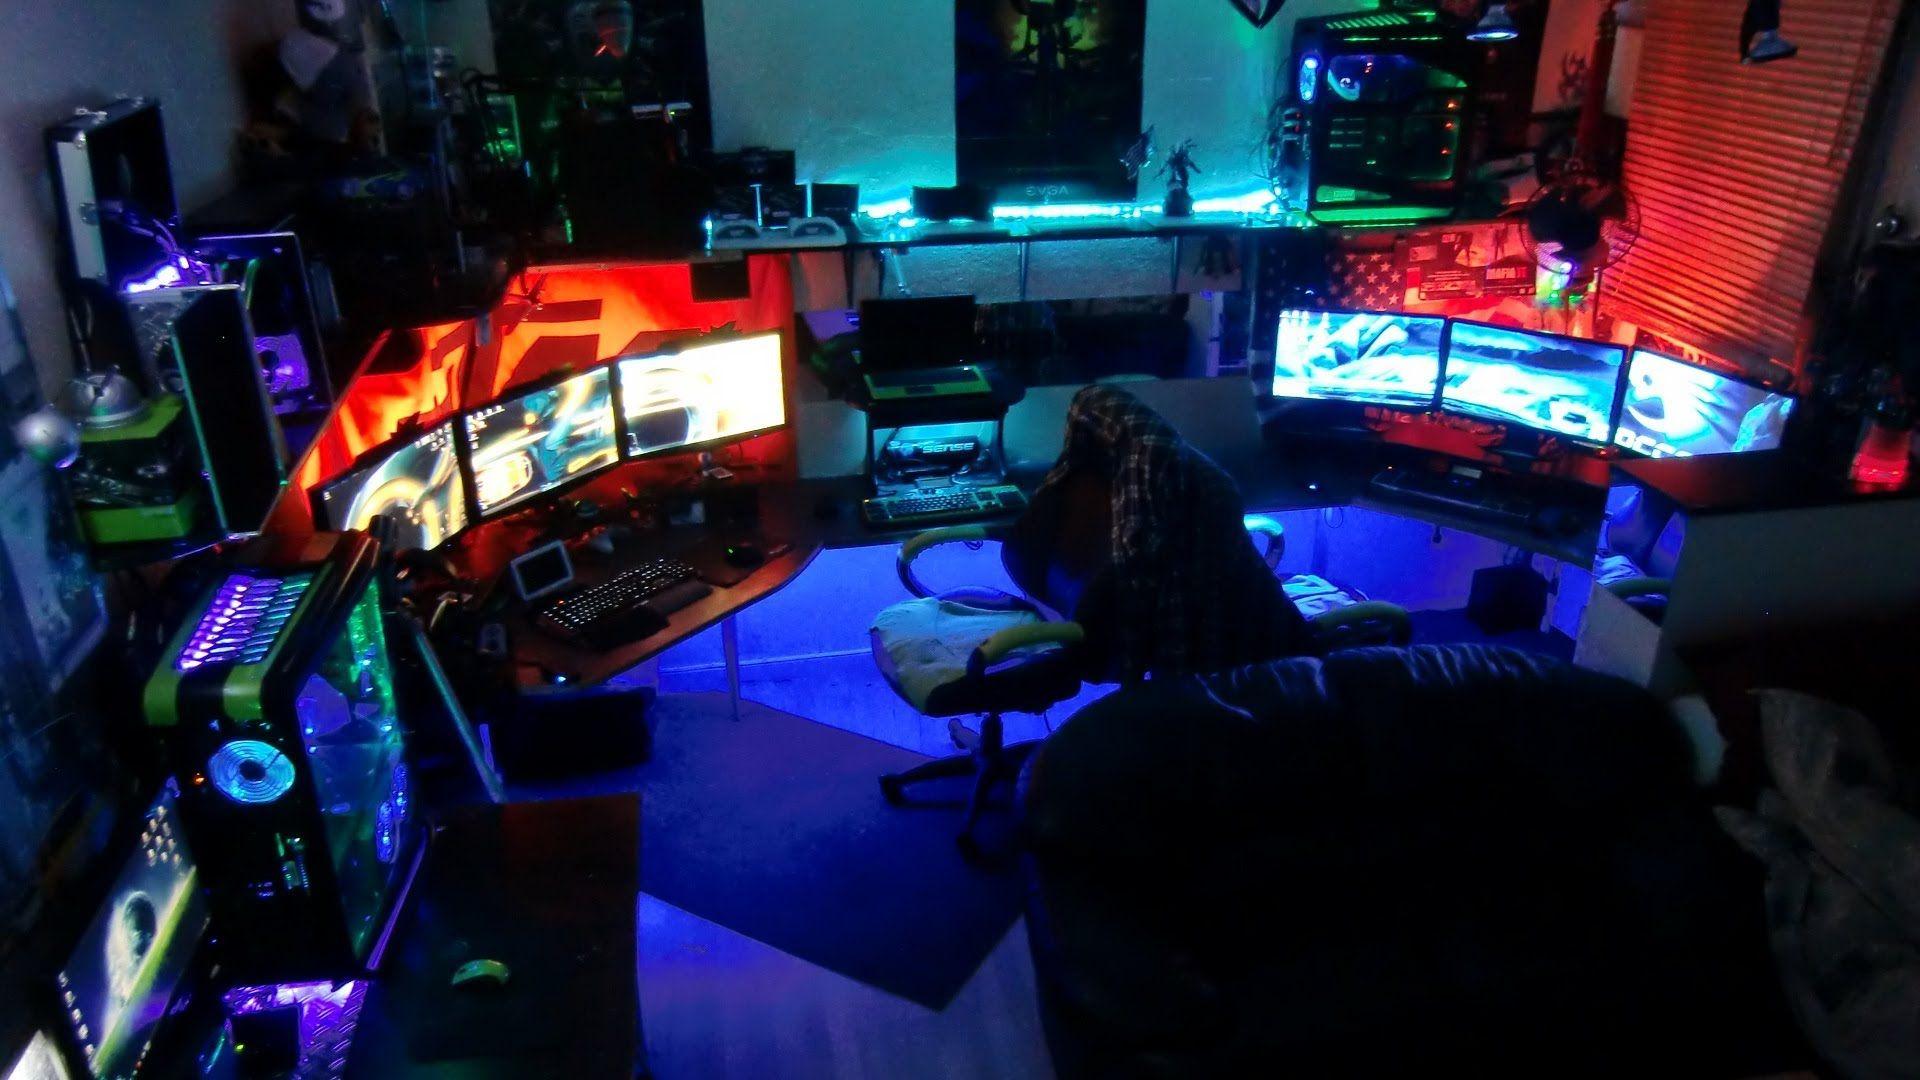 Awesome Computer Gaming Setup